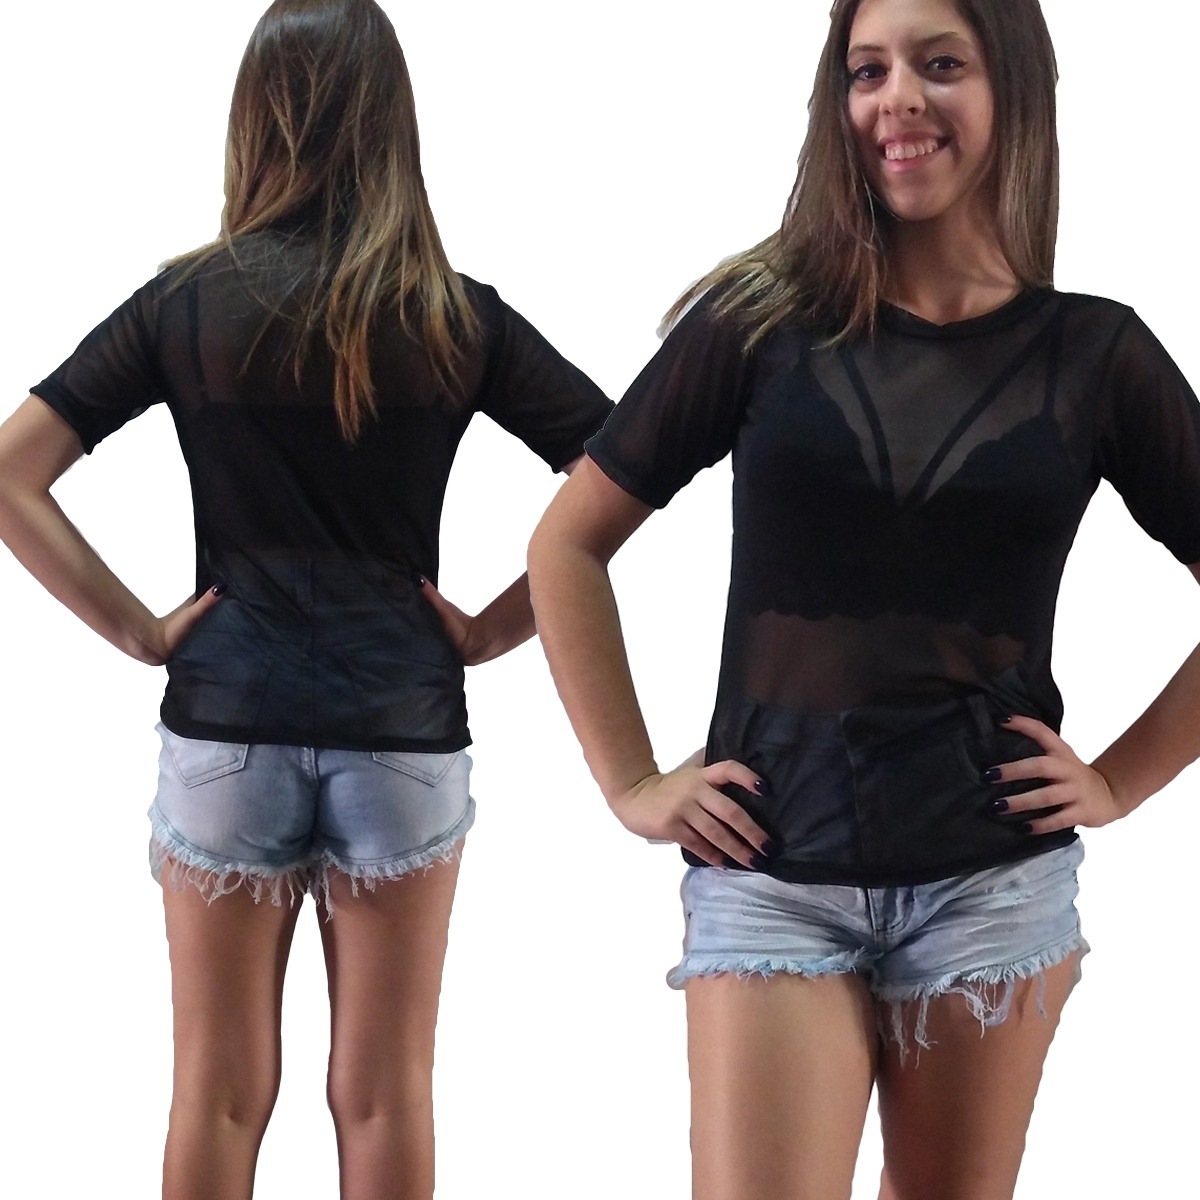 4cd33a9cf7 mercado livre  mercadolivre  comprar  blusas femininas  roupas femininas   atacado  varejo